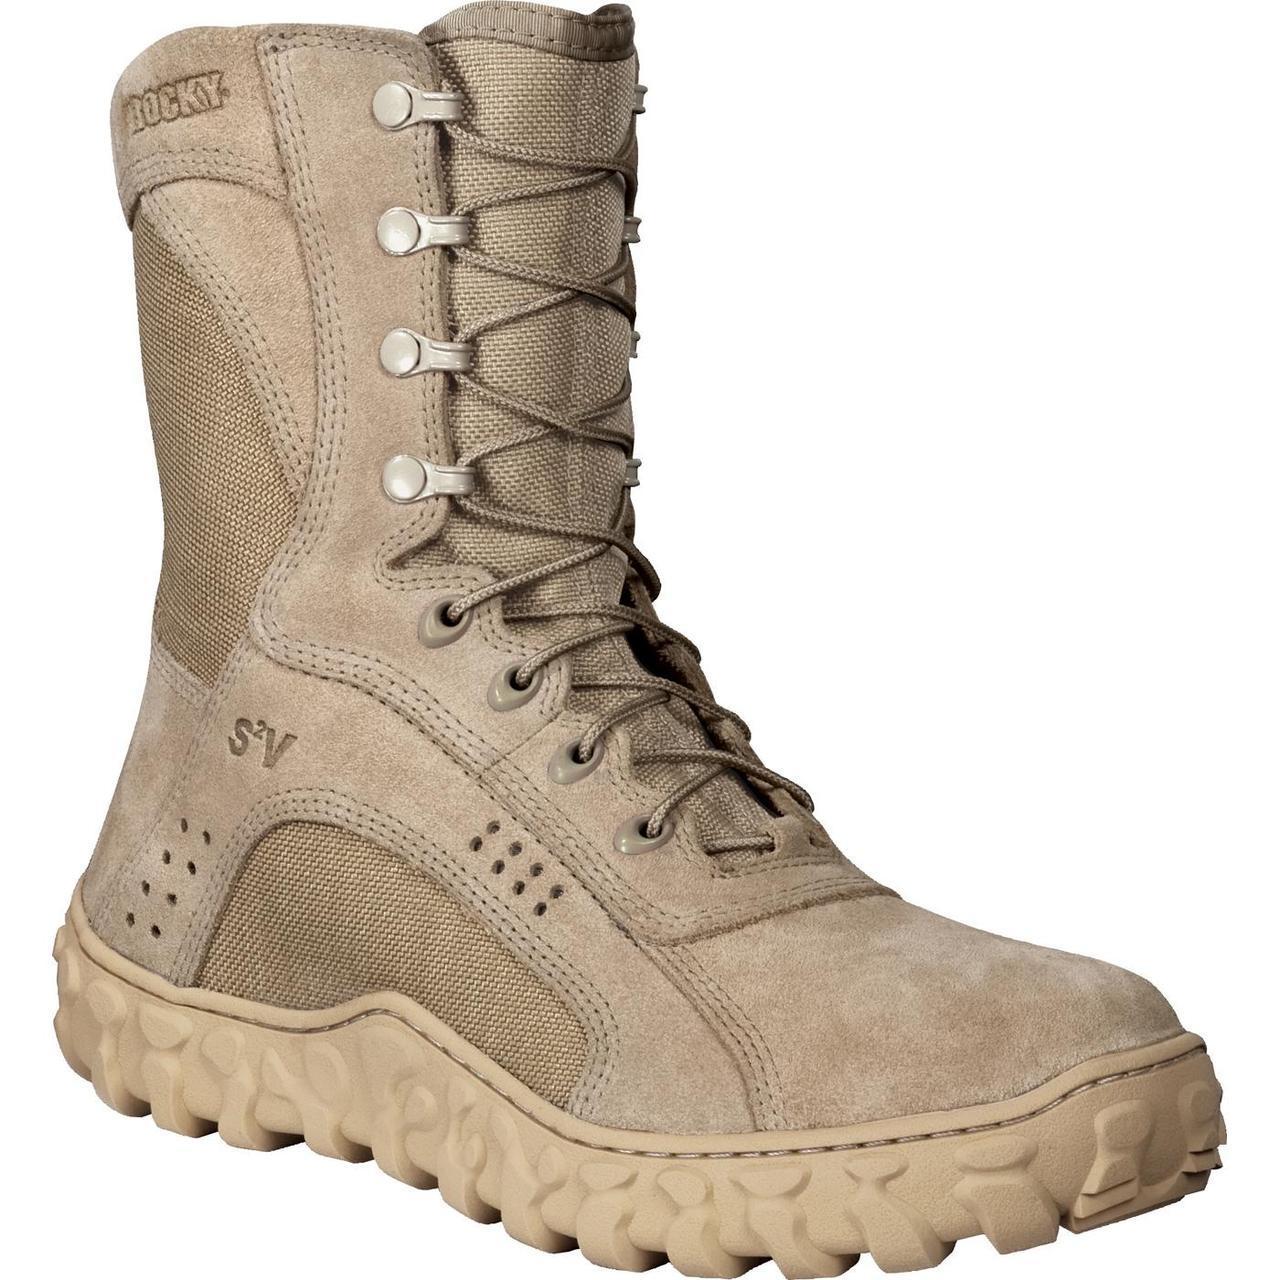 Rocky S2v Vented Military Duty Boots 14 Regular Ebay